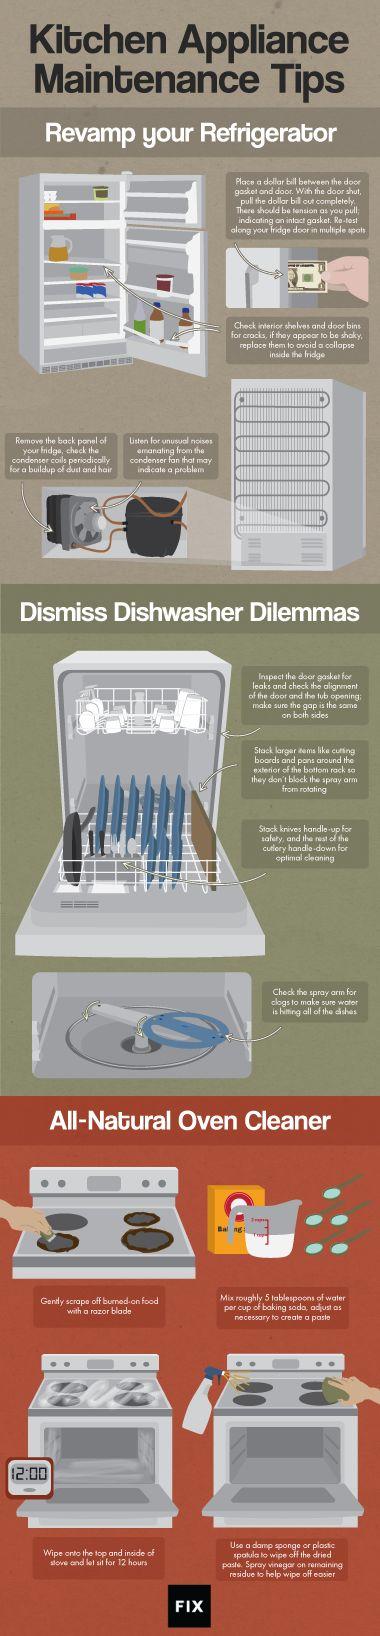 #LGLimitlessDesign #Contest Kitchen Appliance Maintenance and Repair | Fix.com